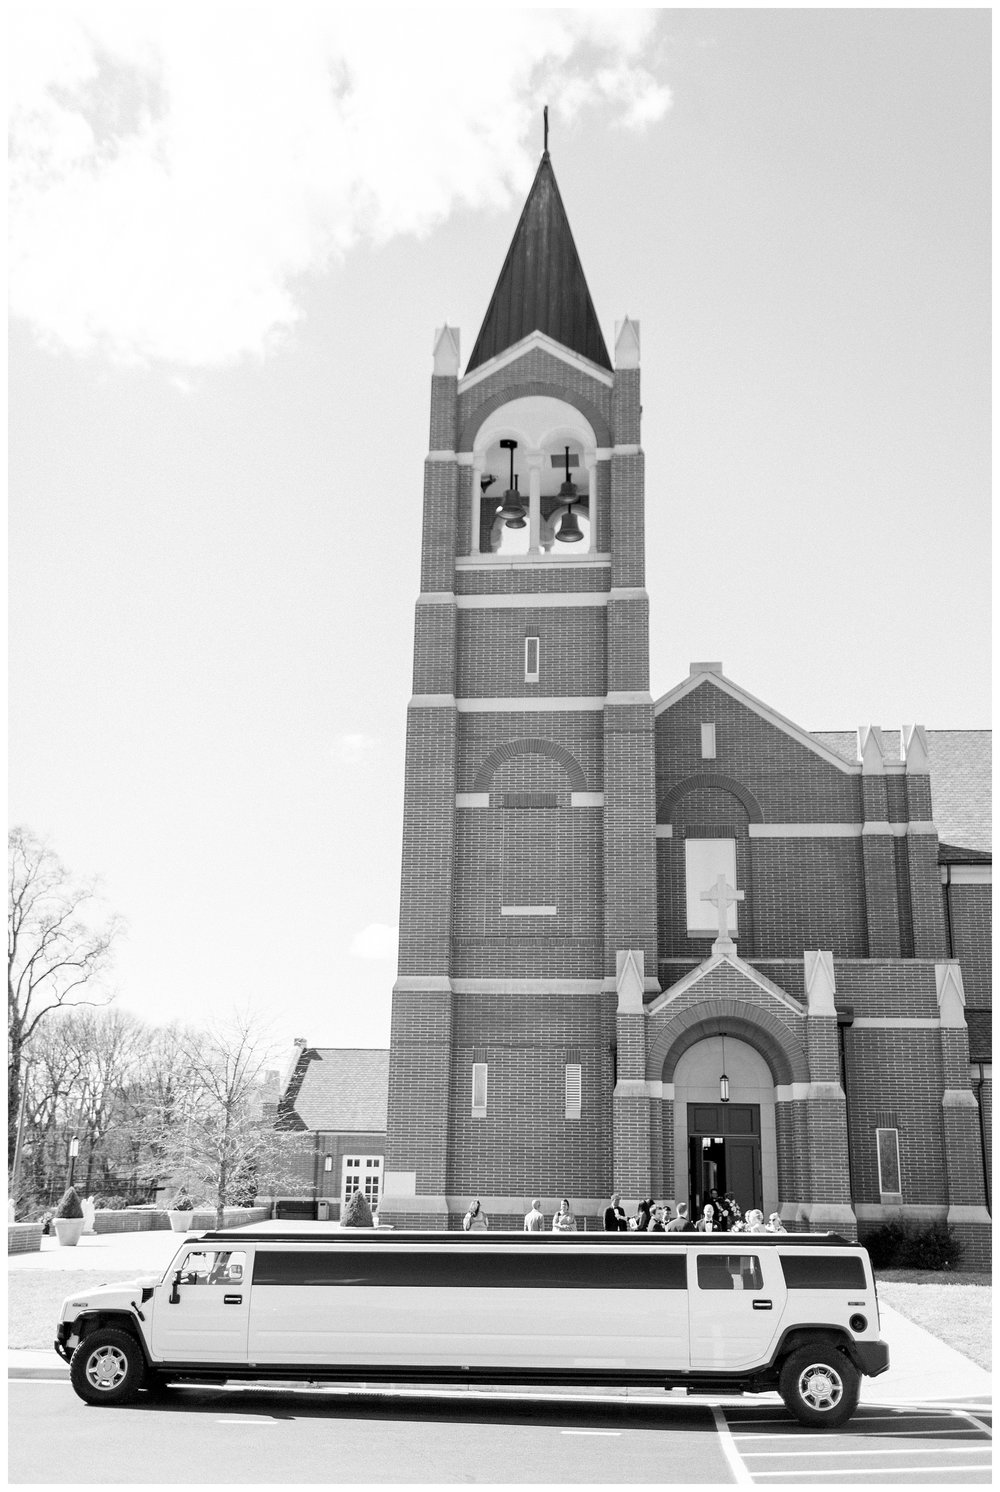 Stone Tower Winery Wedding | Virginia Winter Wedding | VA Wedding Photographer Kir Tuben_0043.jpg